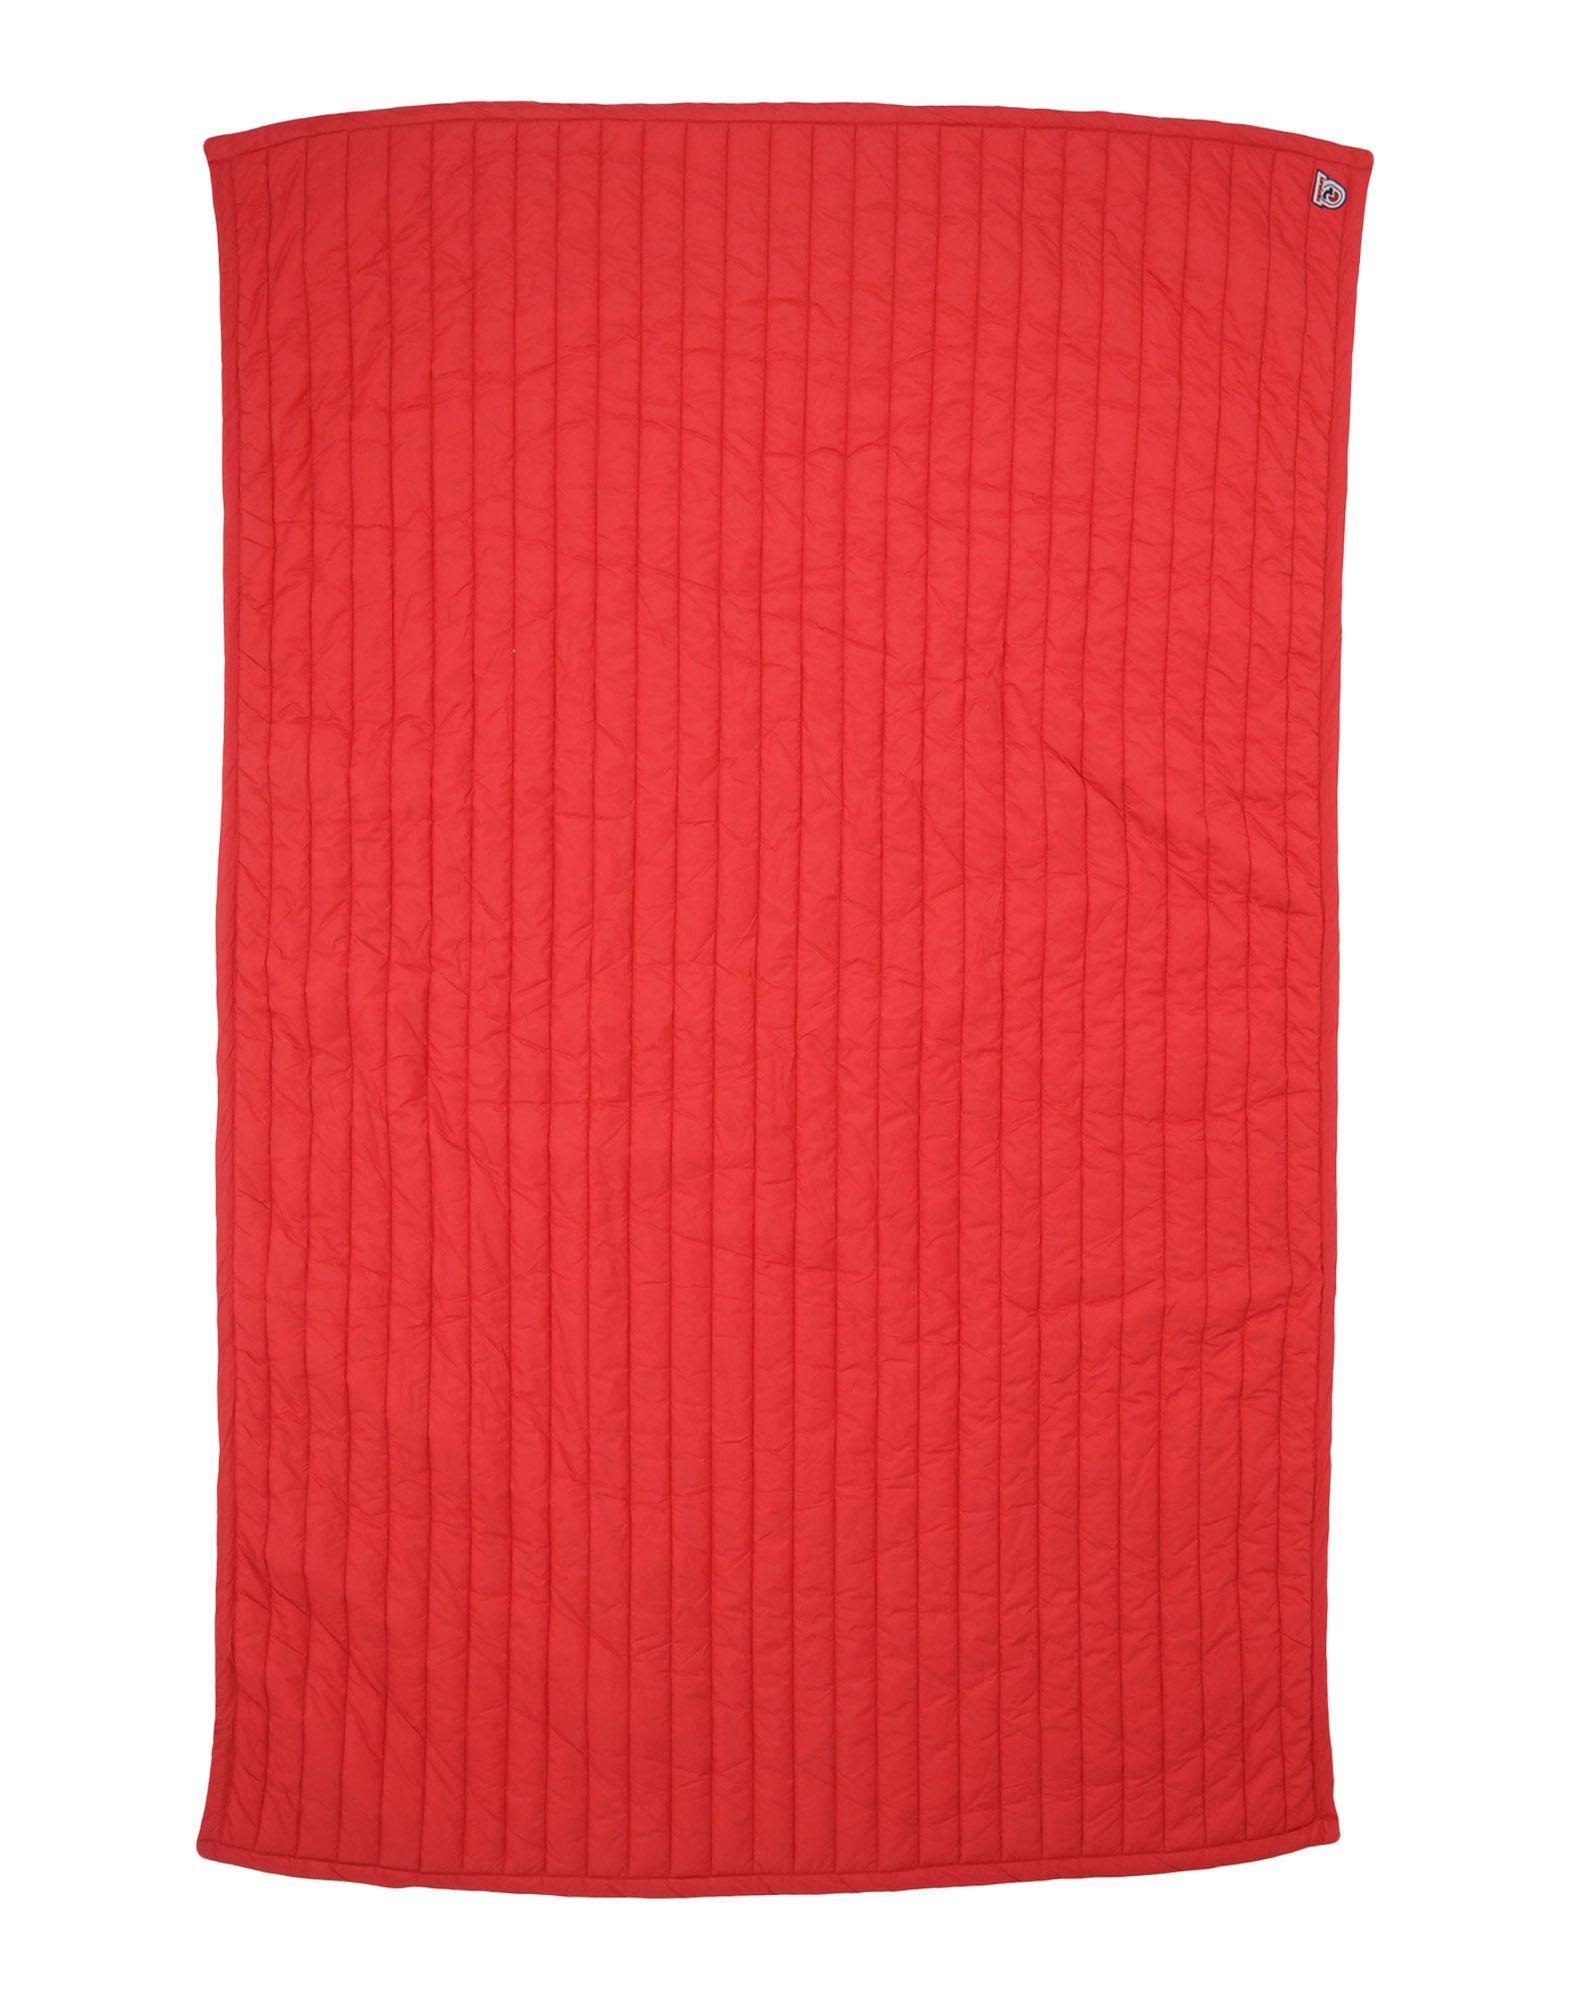 INVICTA Одеяльце для младенцев molo одеяльце для младенцев